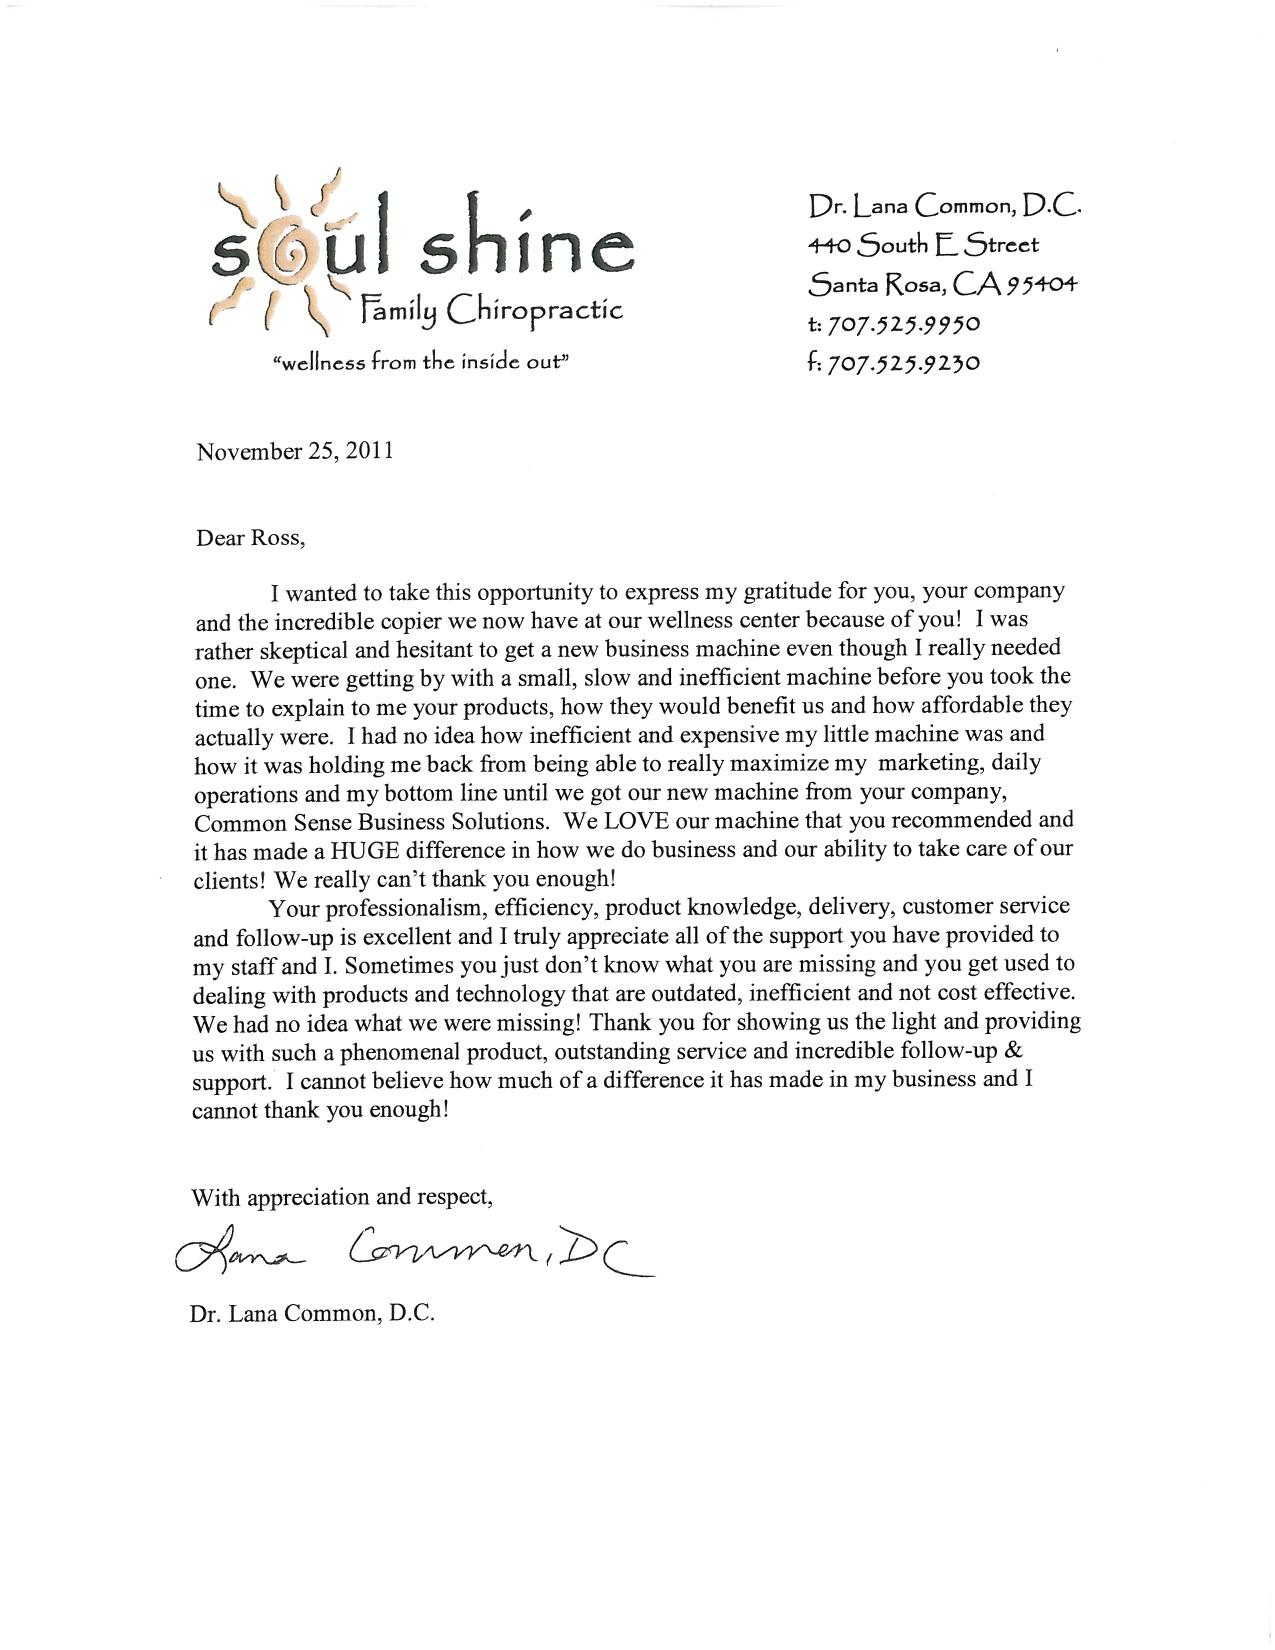 soul shine testimonial letters